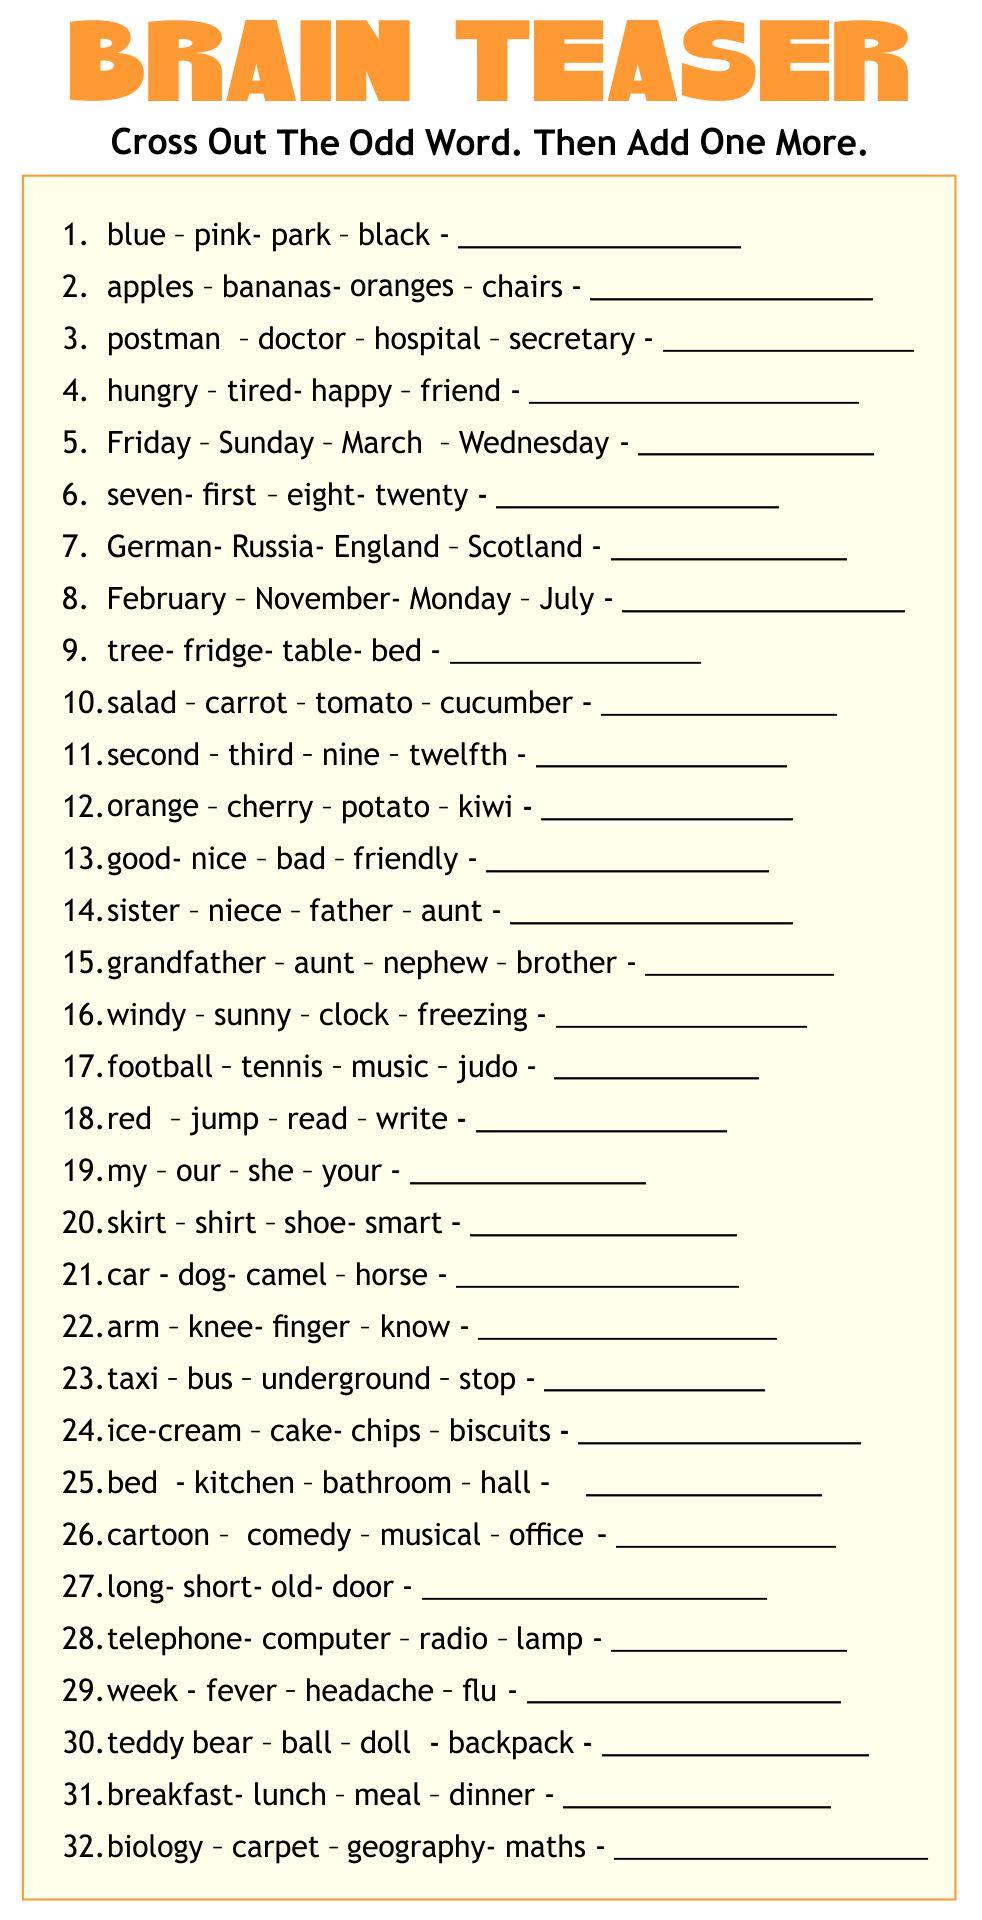 Adult Brain Teasers Worksheet